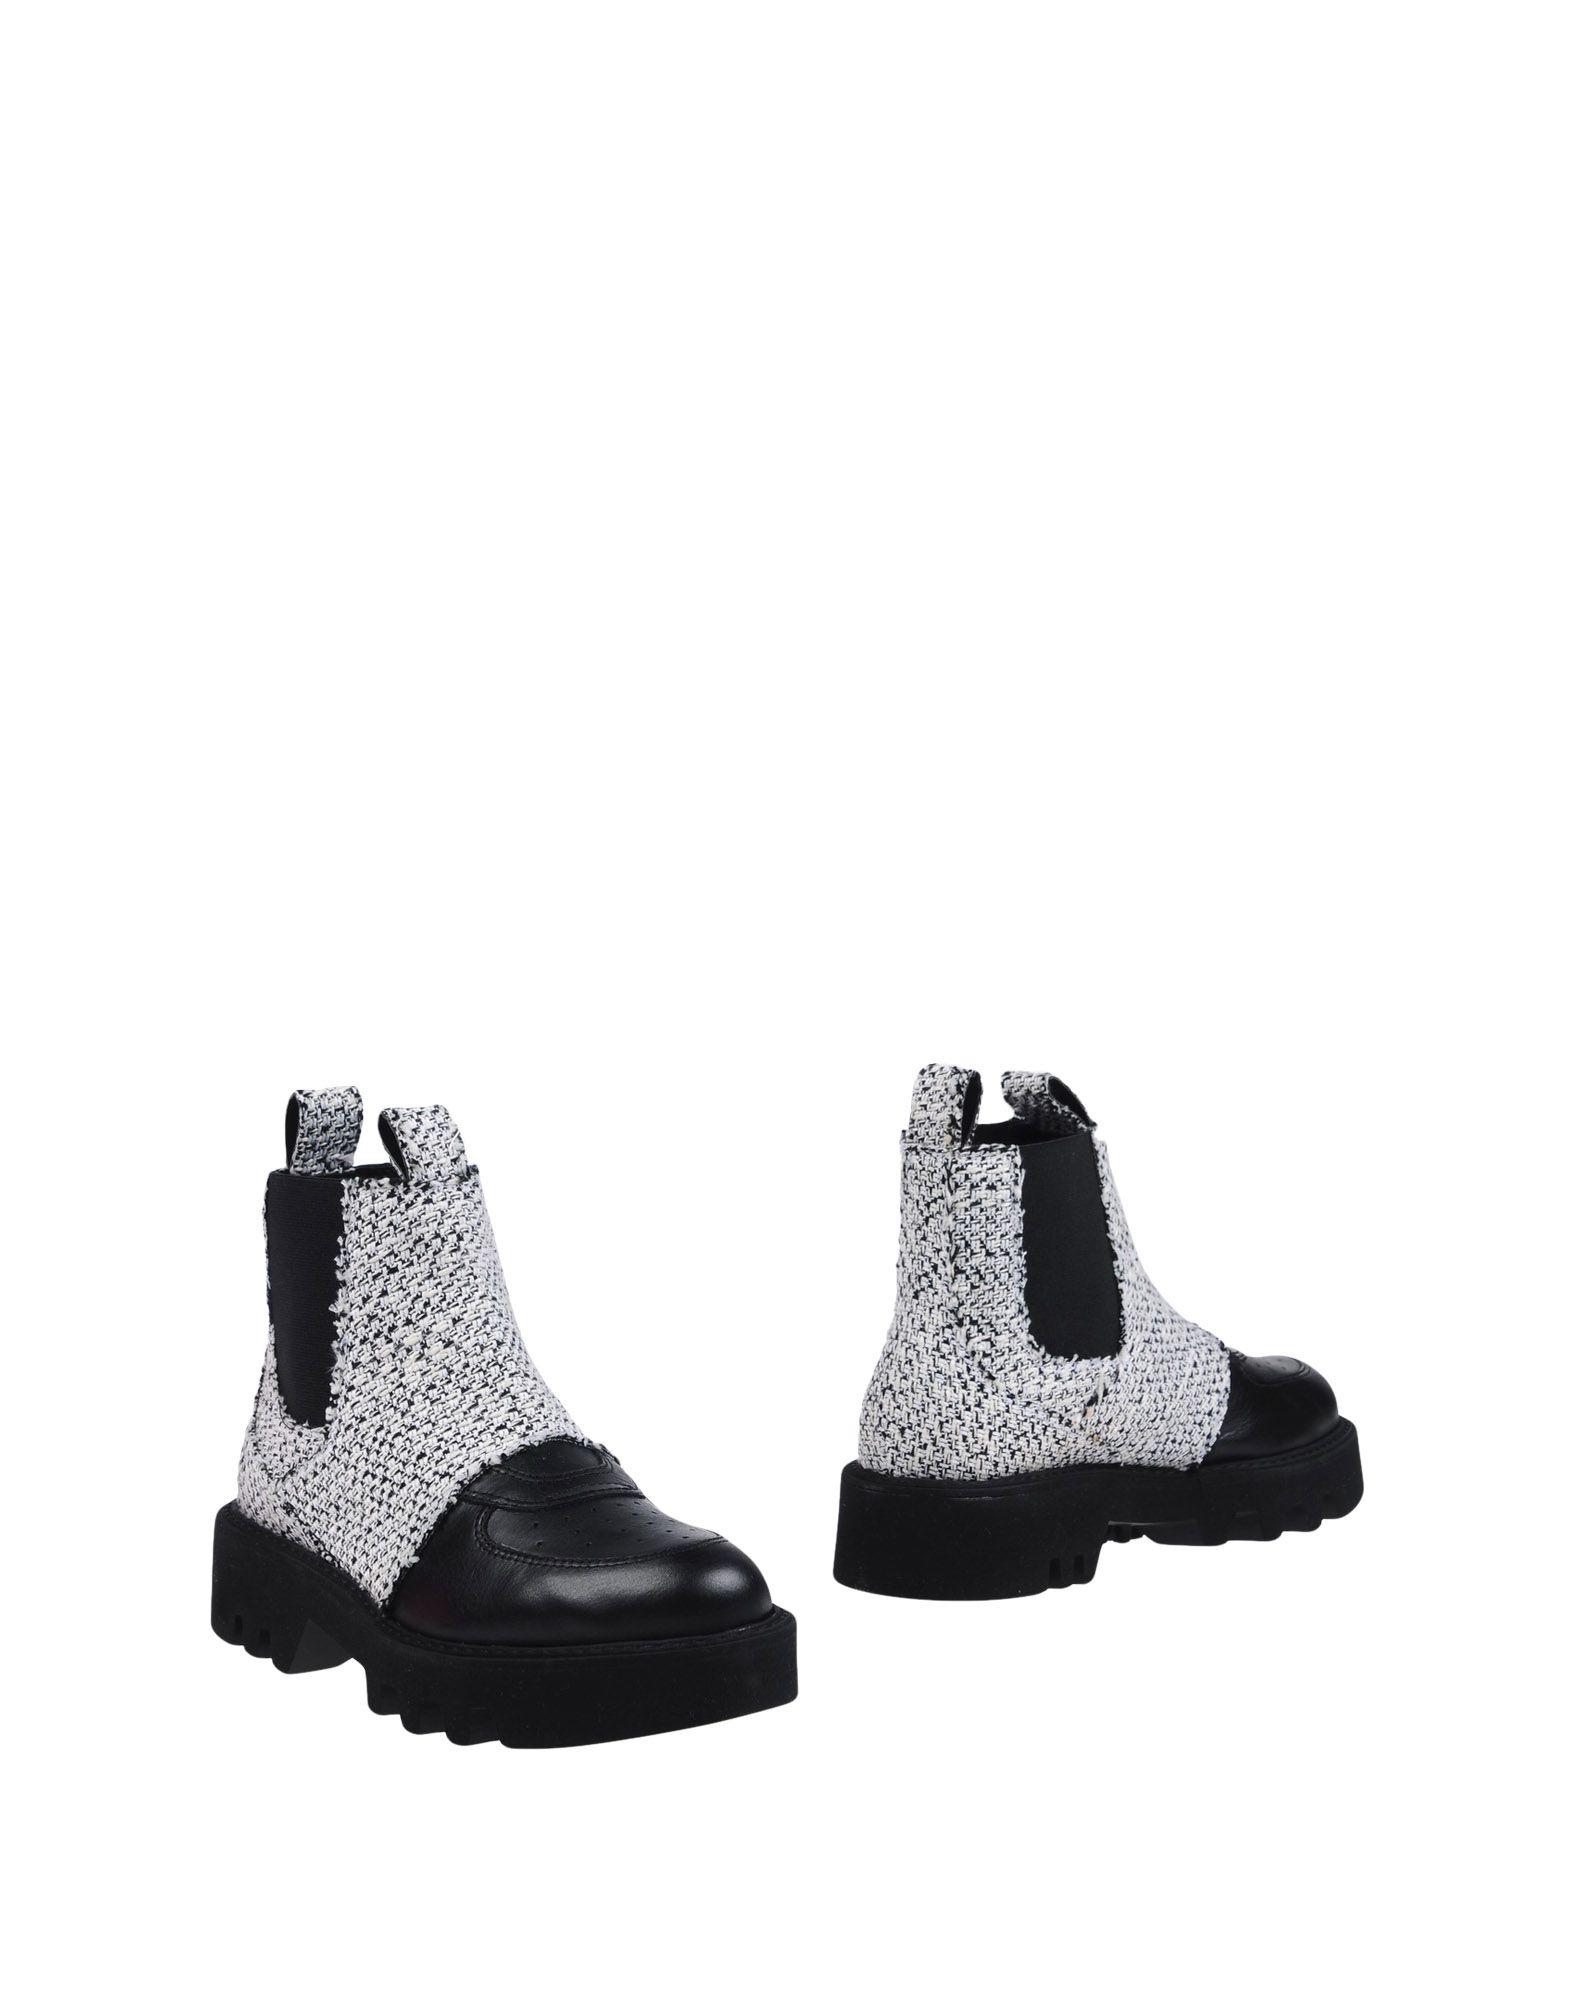 MY GREY Полусапоги и высокие ботинки magazzini del sale полусапоги и высокие ботинки